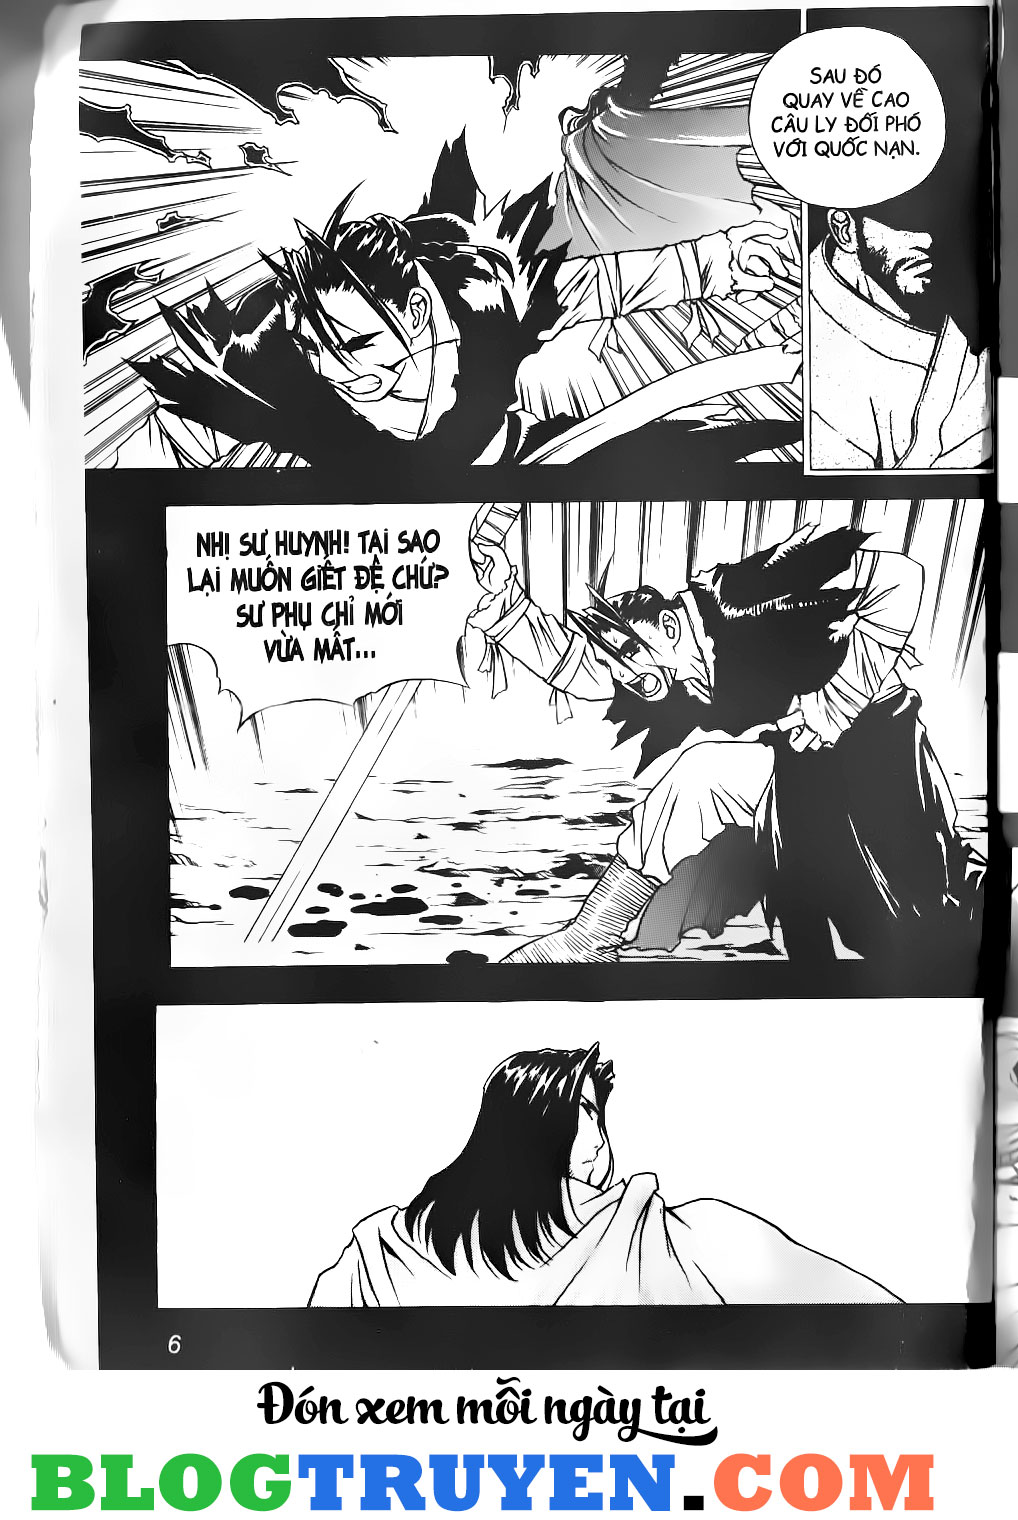 Thiên Lang Liệt Truyện Scan Chap 1 - Truyen.Chap.VN